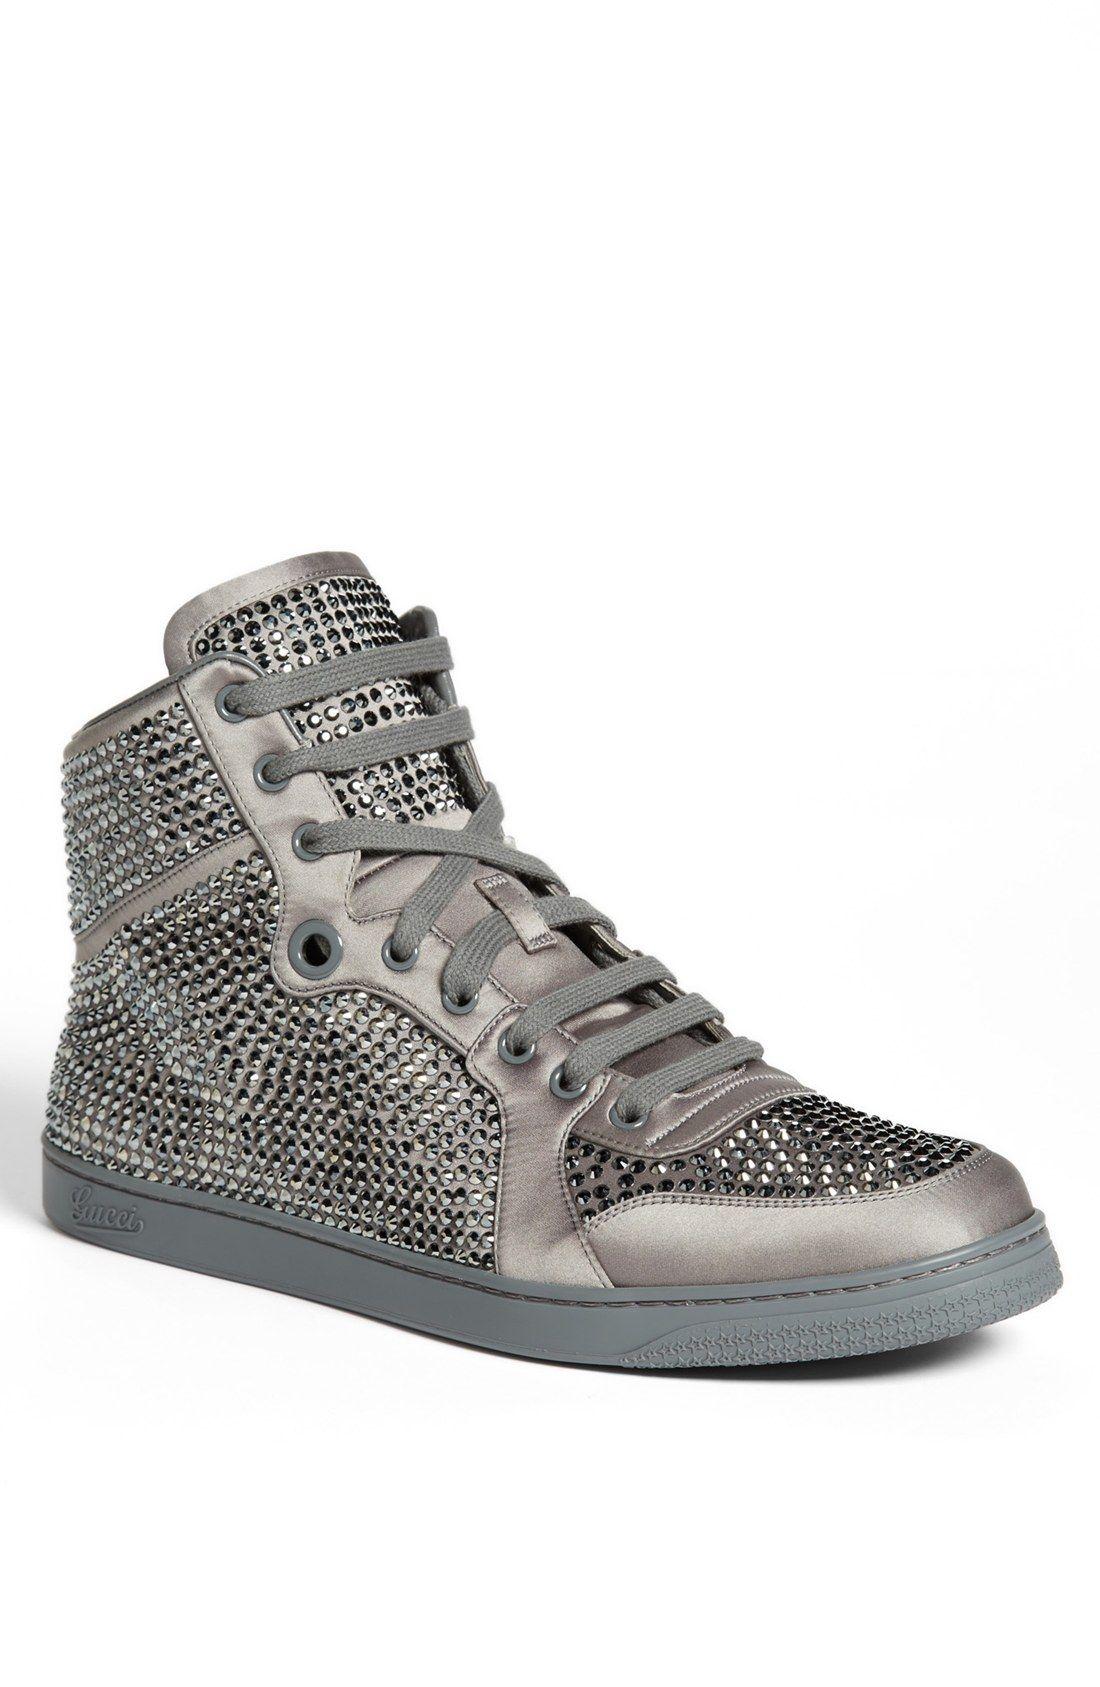 032ad5cd01d4 coda sneakers men